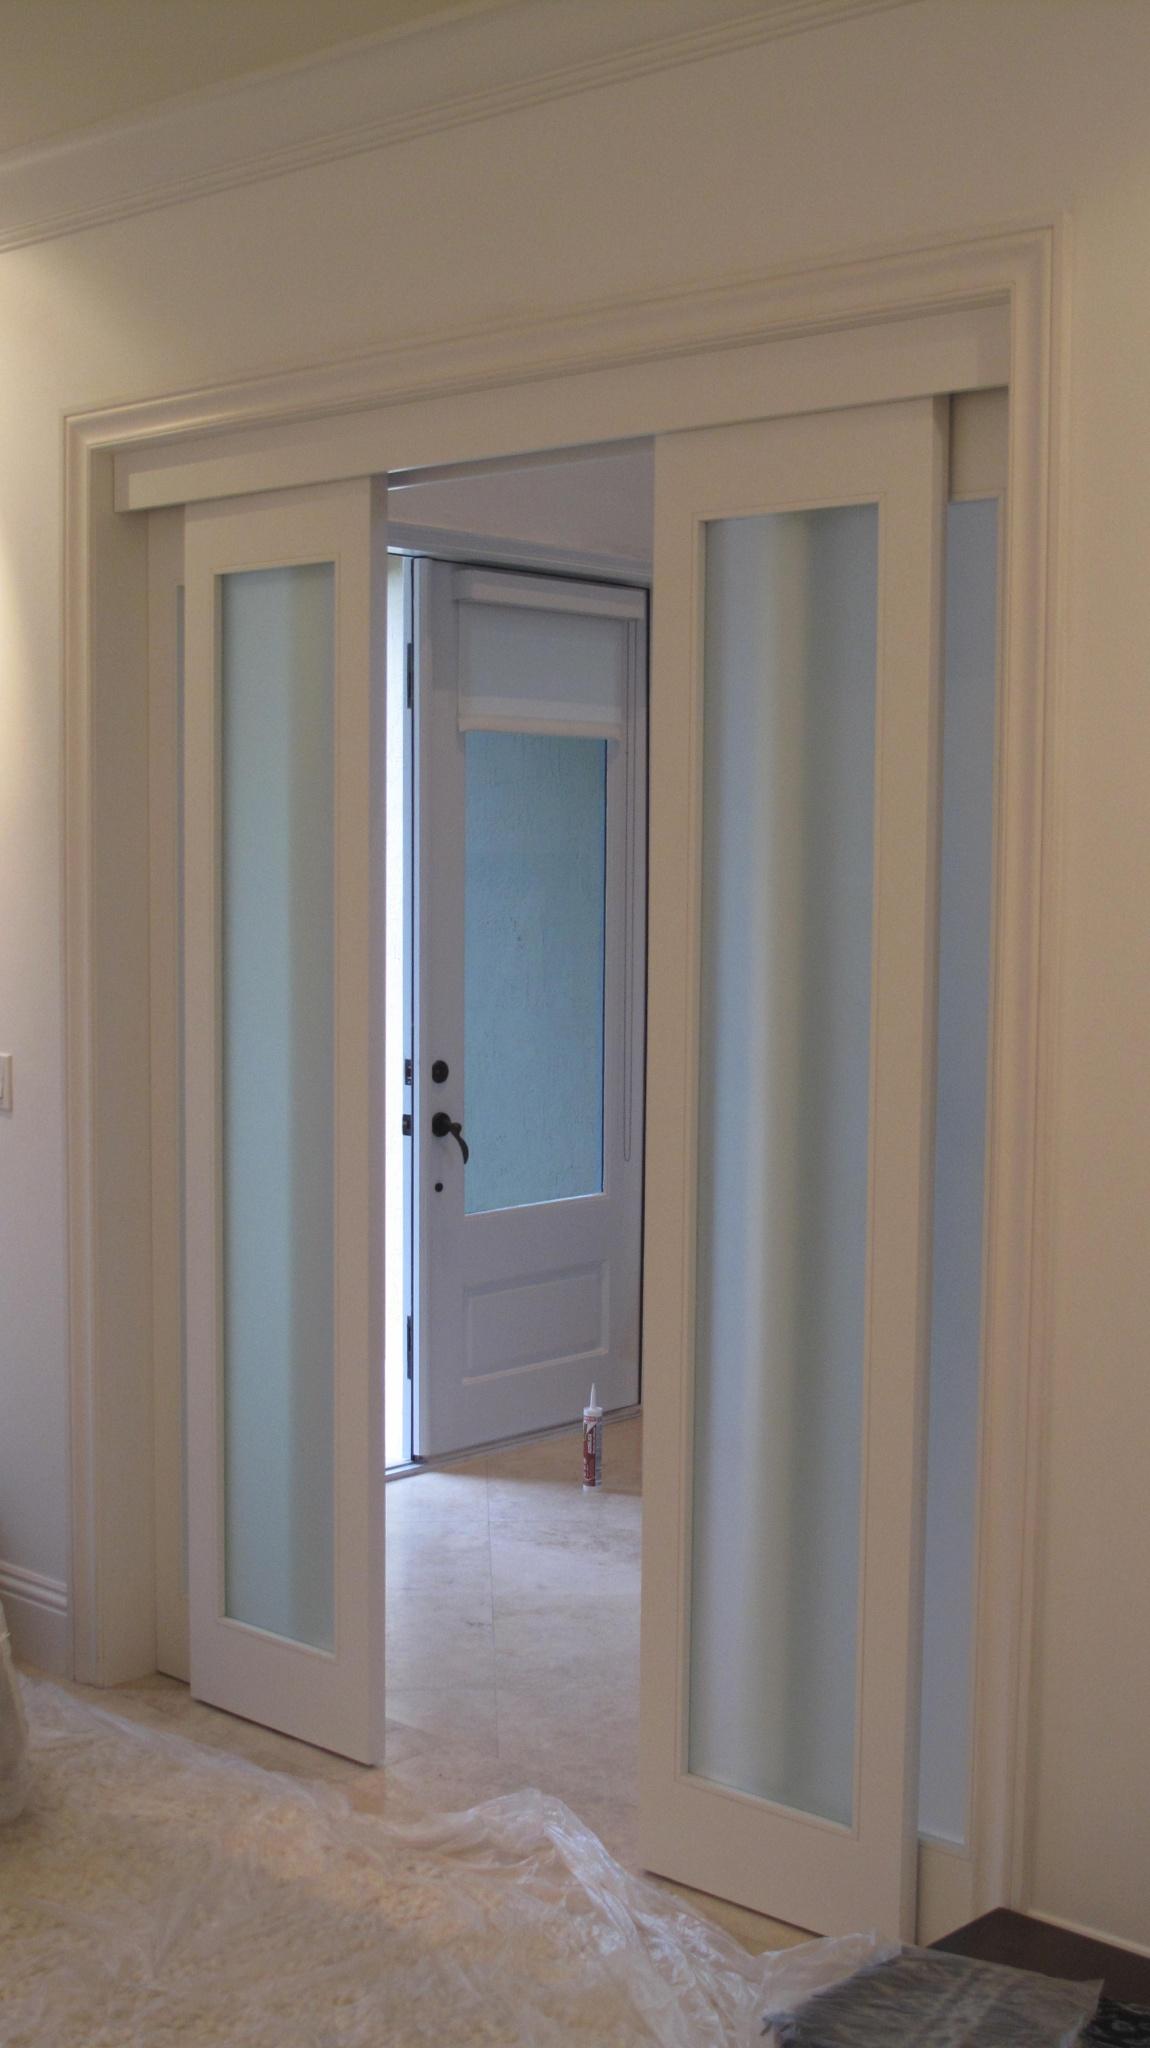 Panels-And-Doors-47.jpg